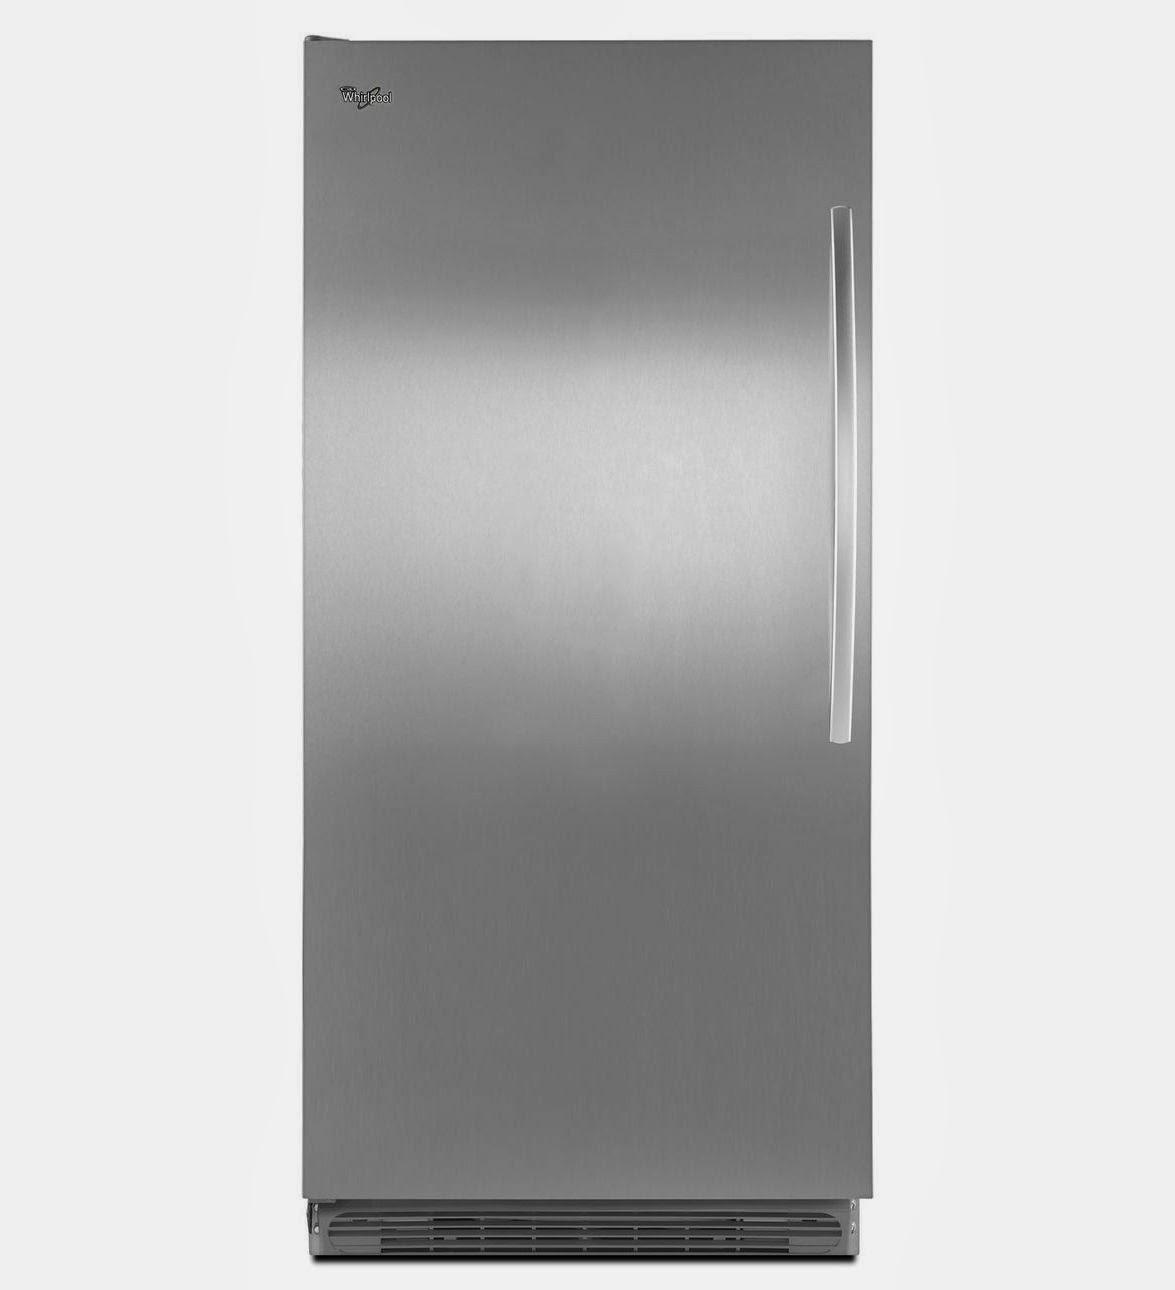 Whirlpool Top Freezer Refrigerator Whirlpool Refrigerator Brand: Sidekick Stainless Steel ...